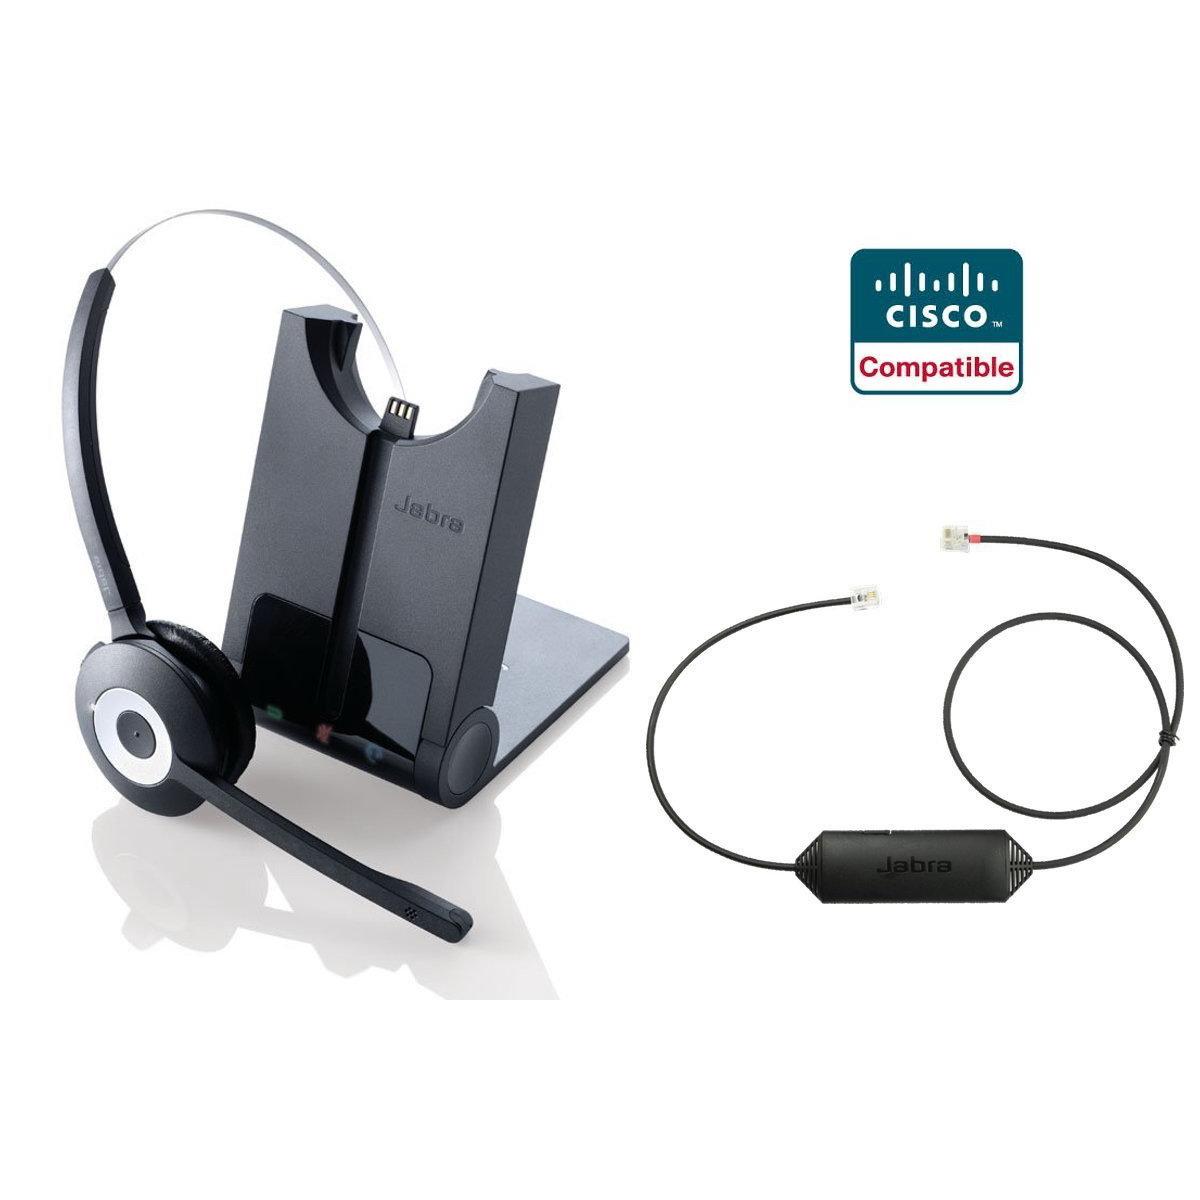 Jabra Pro 920 Cisco Ip Phone Wireless Headset Ehs Remote Bundle